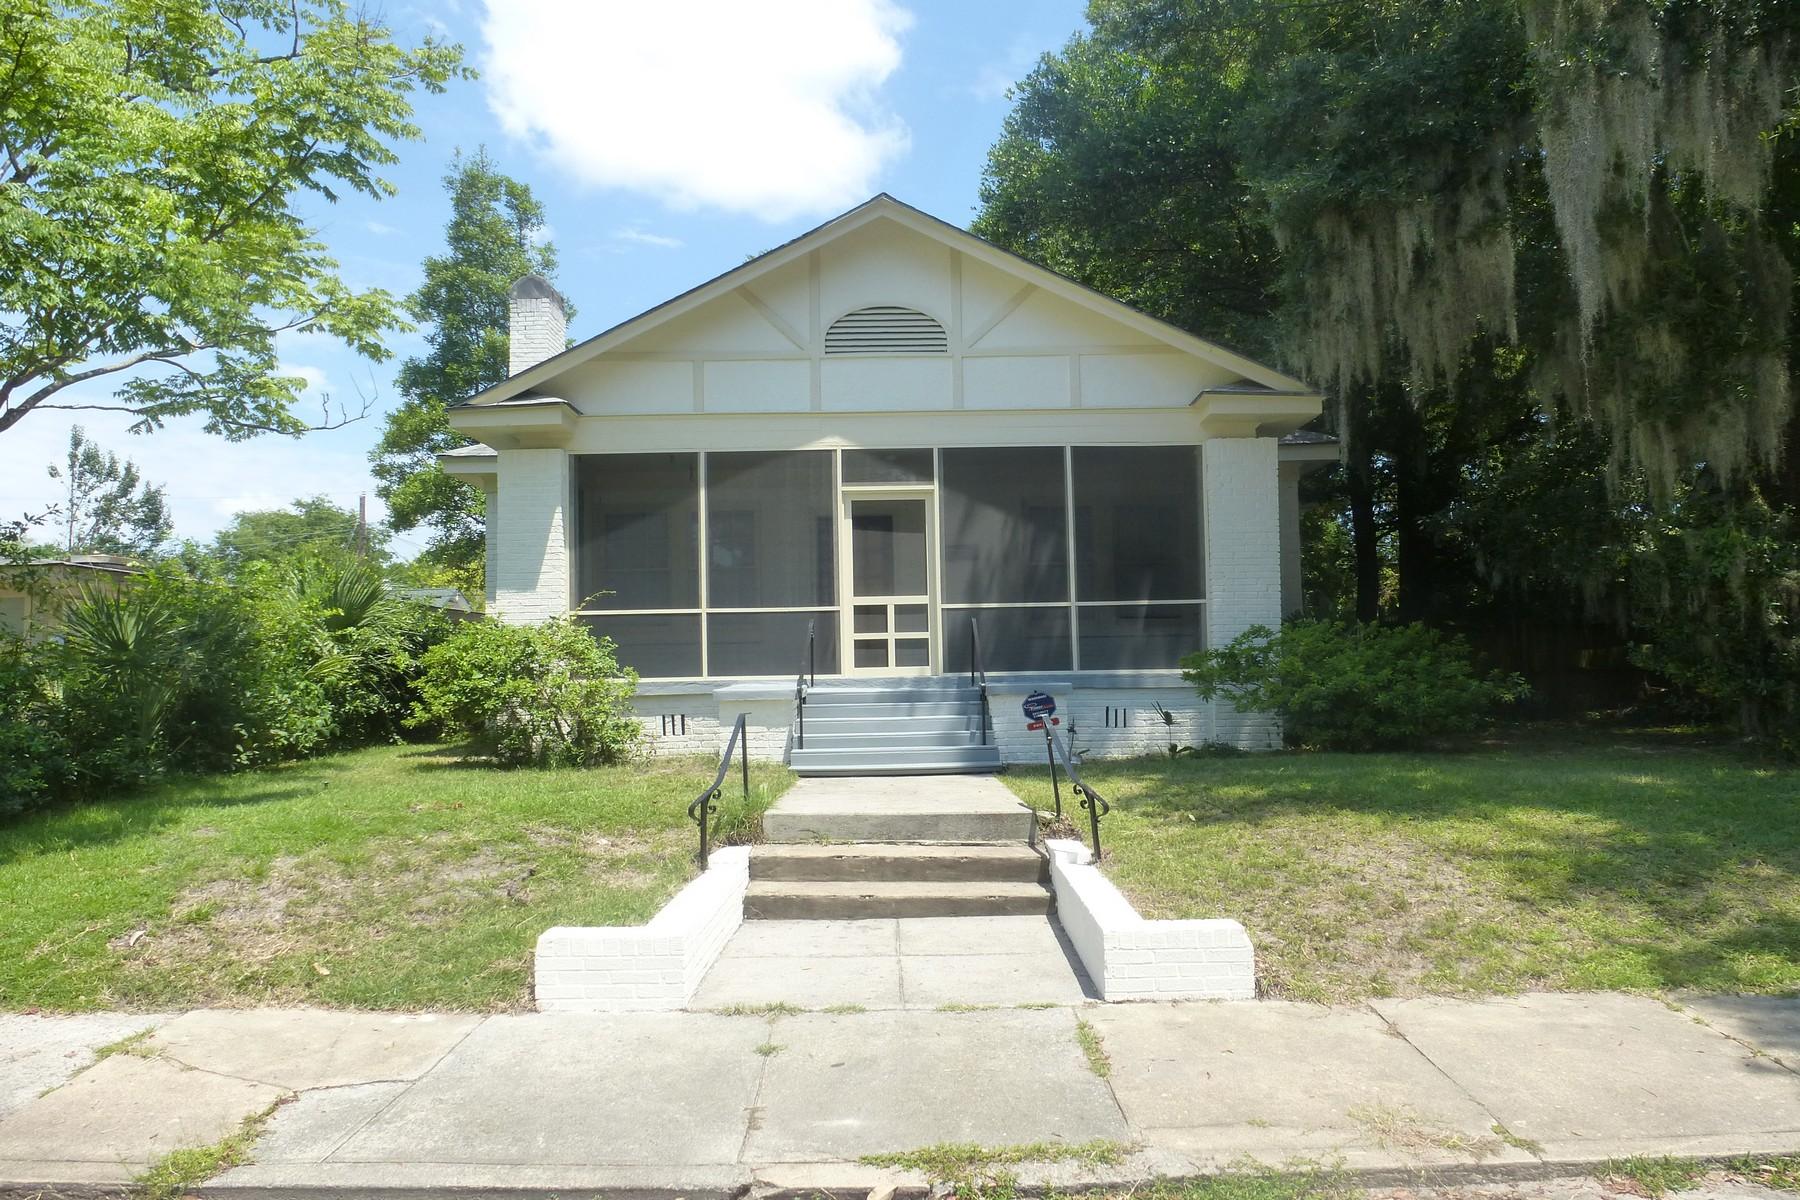 Single Family Home for Sale at Midtown Area 224 E. 51st Street Savannah, Georgia 31405 United States